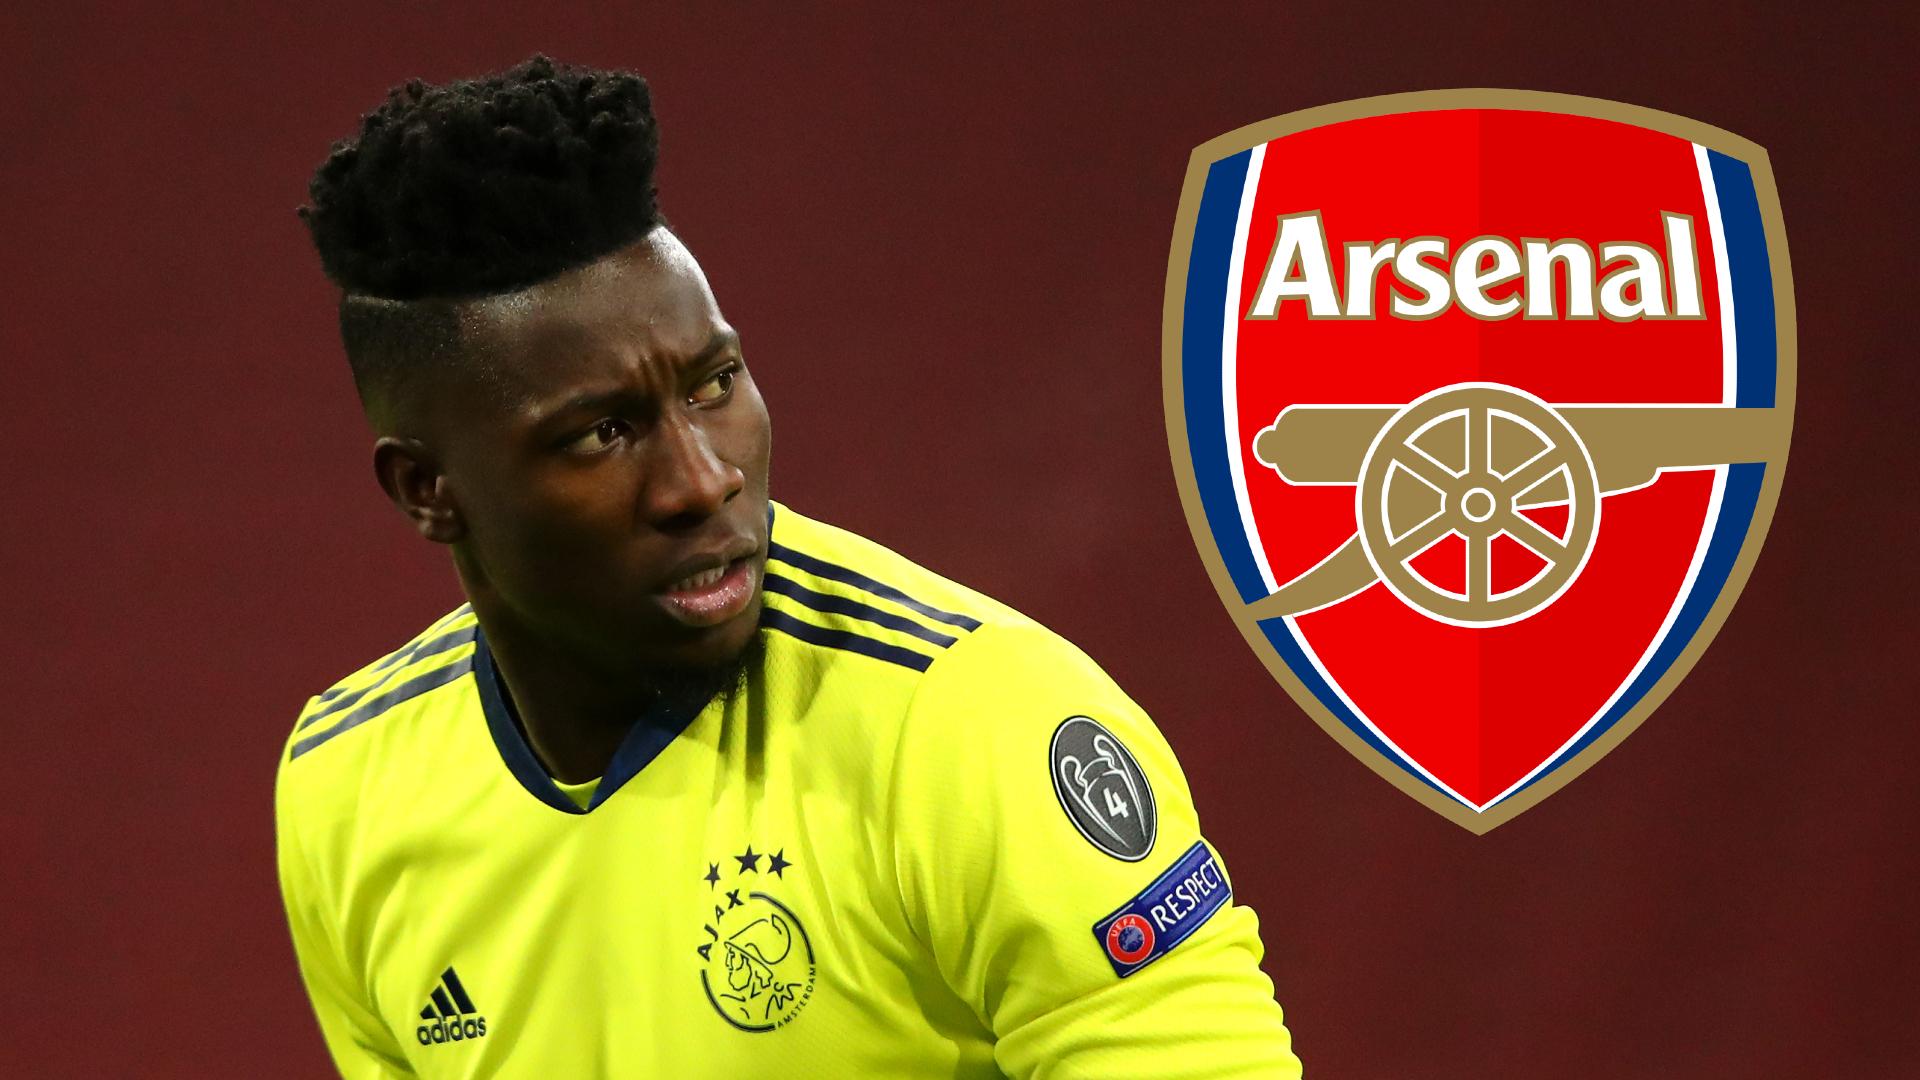 Fabrizio Romano uled out any chance of Arsenal re-signing Wojciech Szczesny, but interest in signing Andre Onana - Bóng Đá